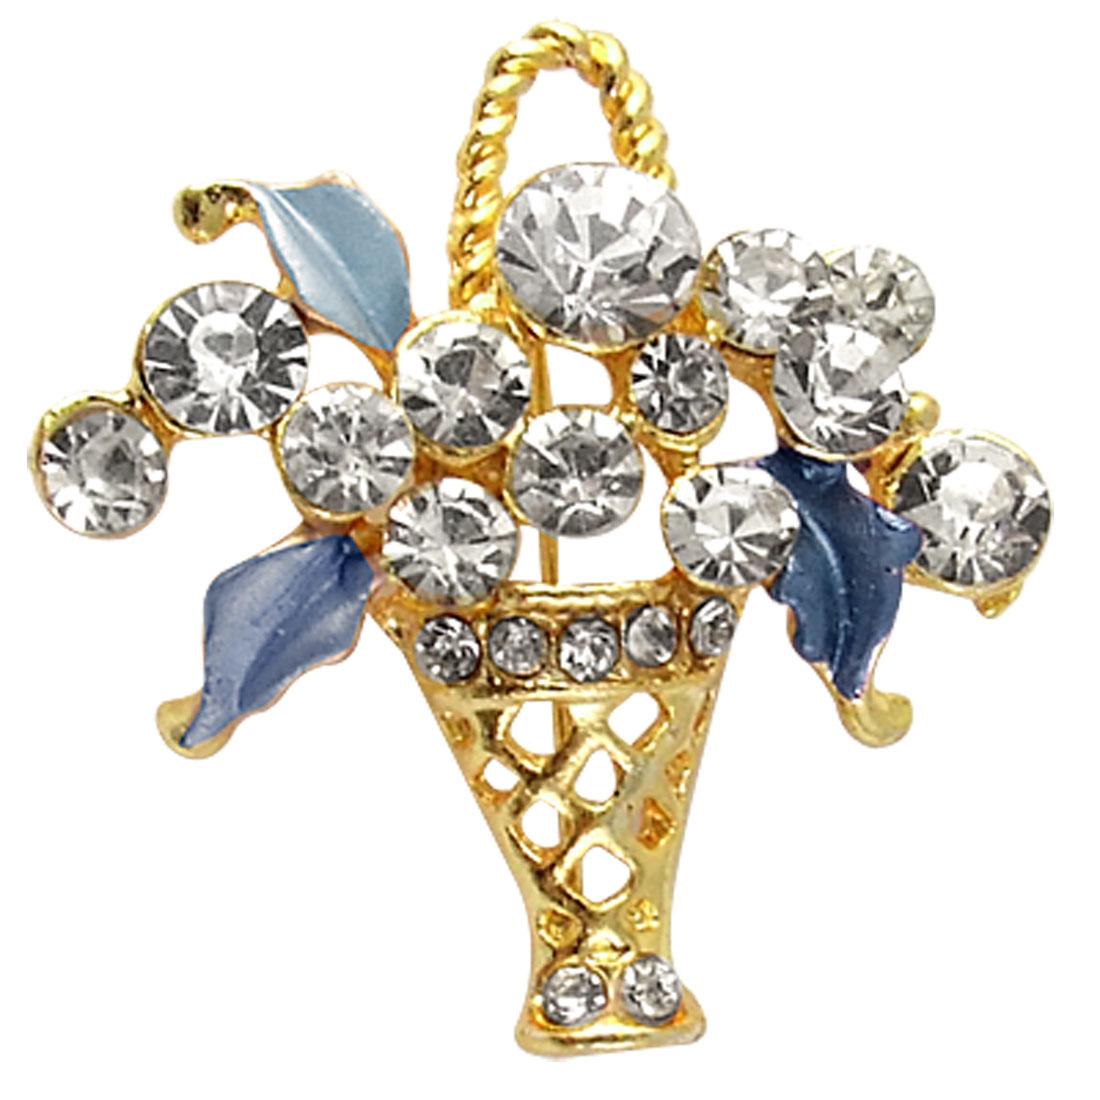 Handmade Pale Blue Floral Basket Metal Safety Pin Brooch